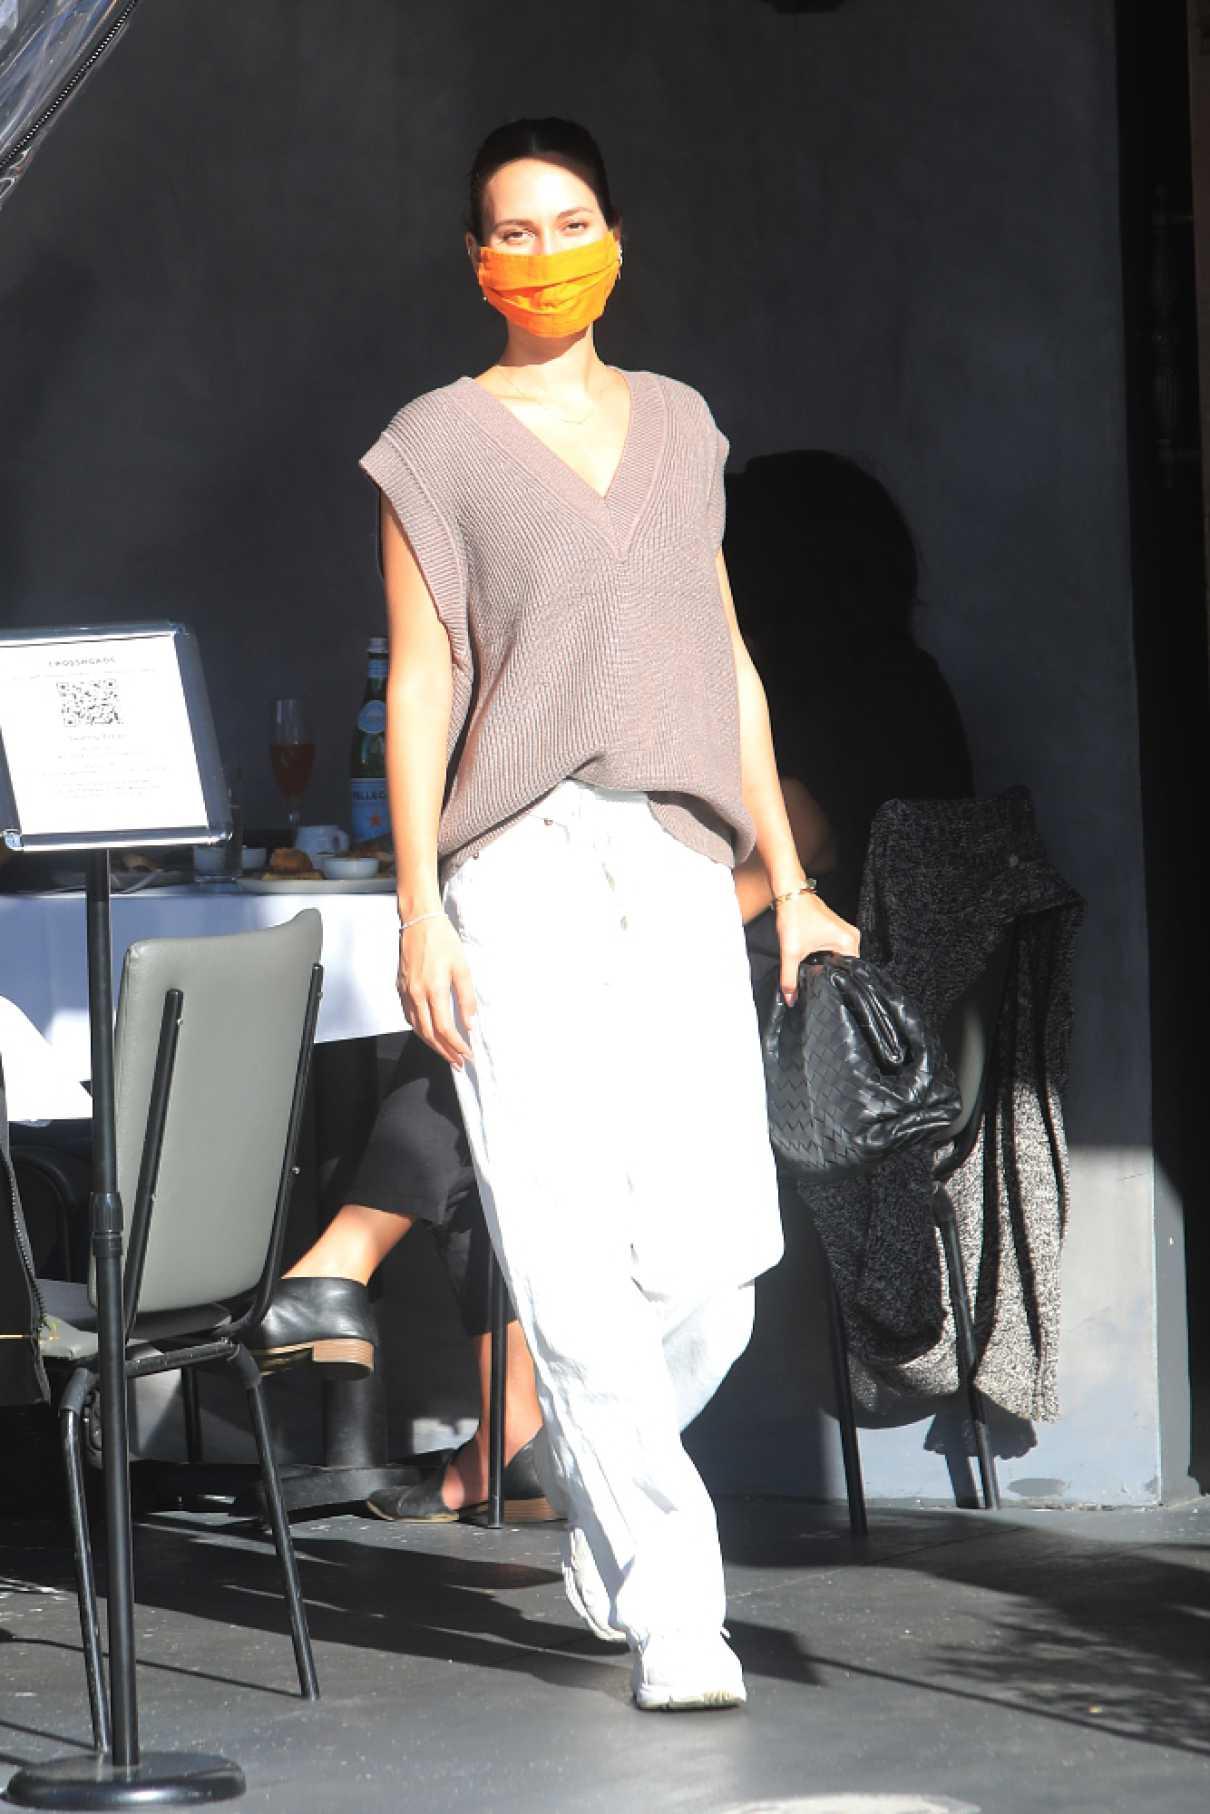 Tatiana Dieteman in a White Pants